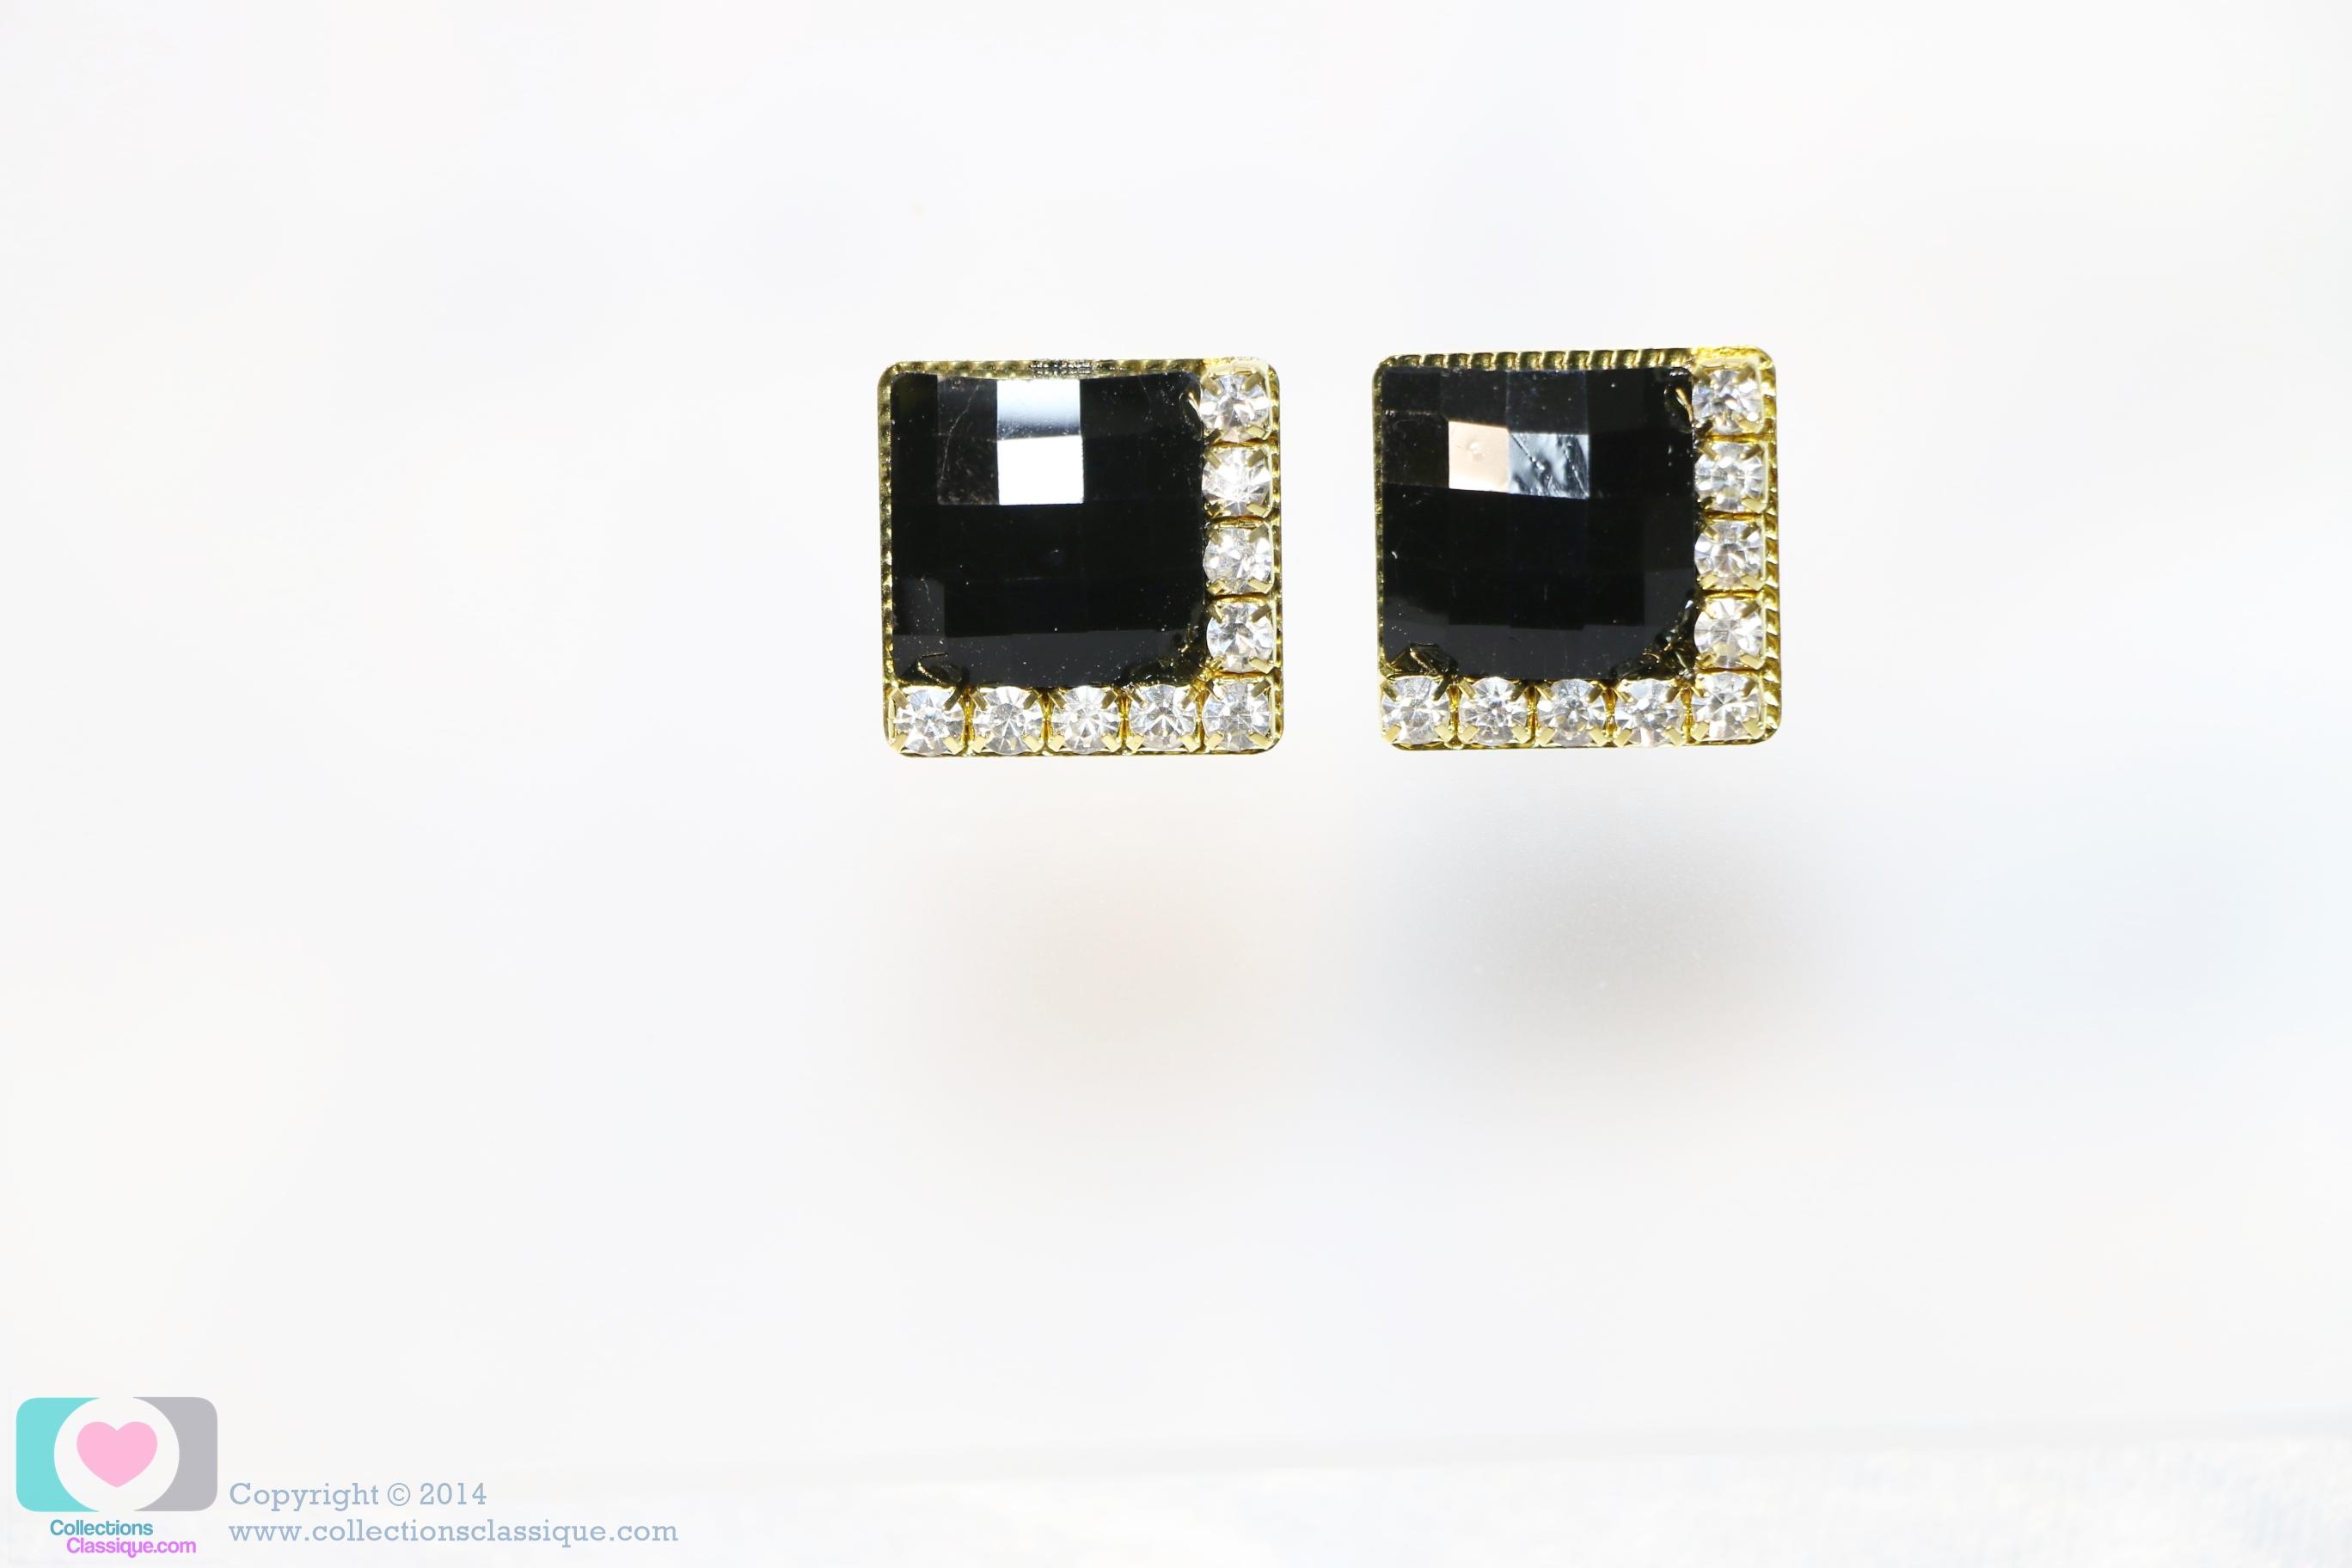 E99032 The Black Gems ตุ้มหูแฟชั่น